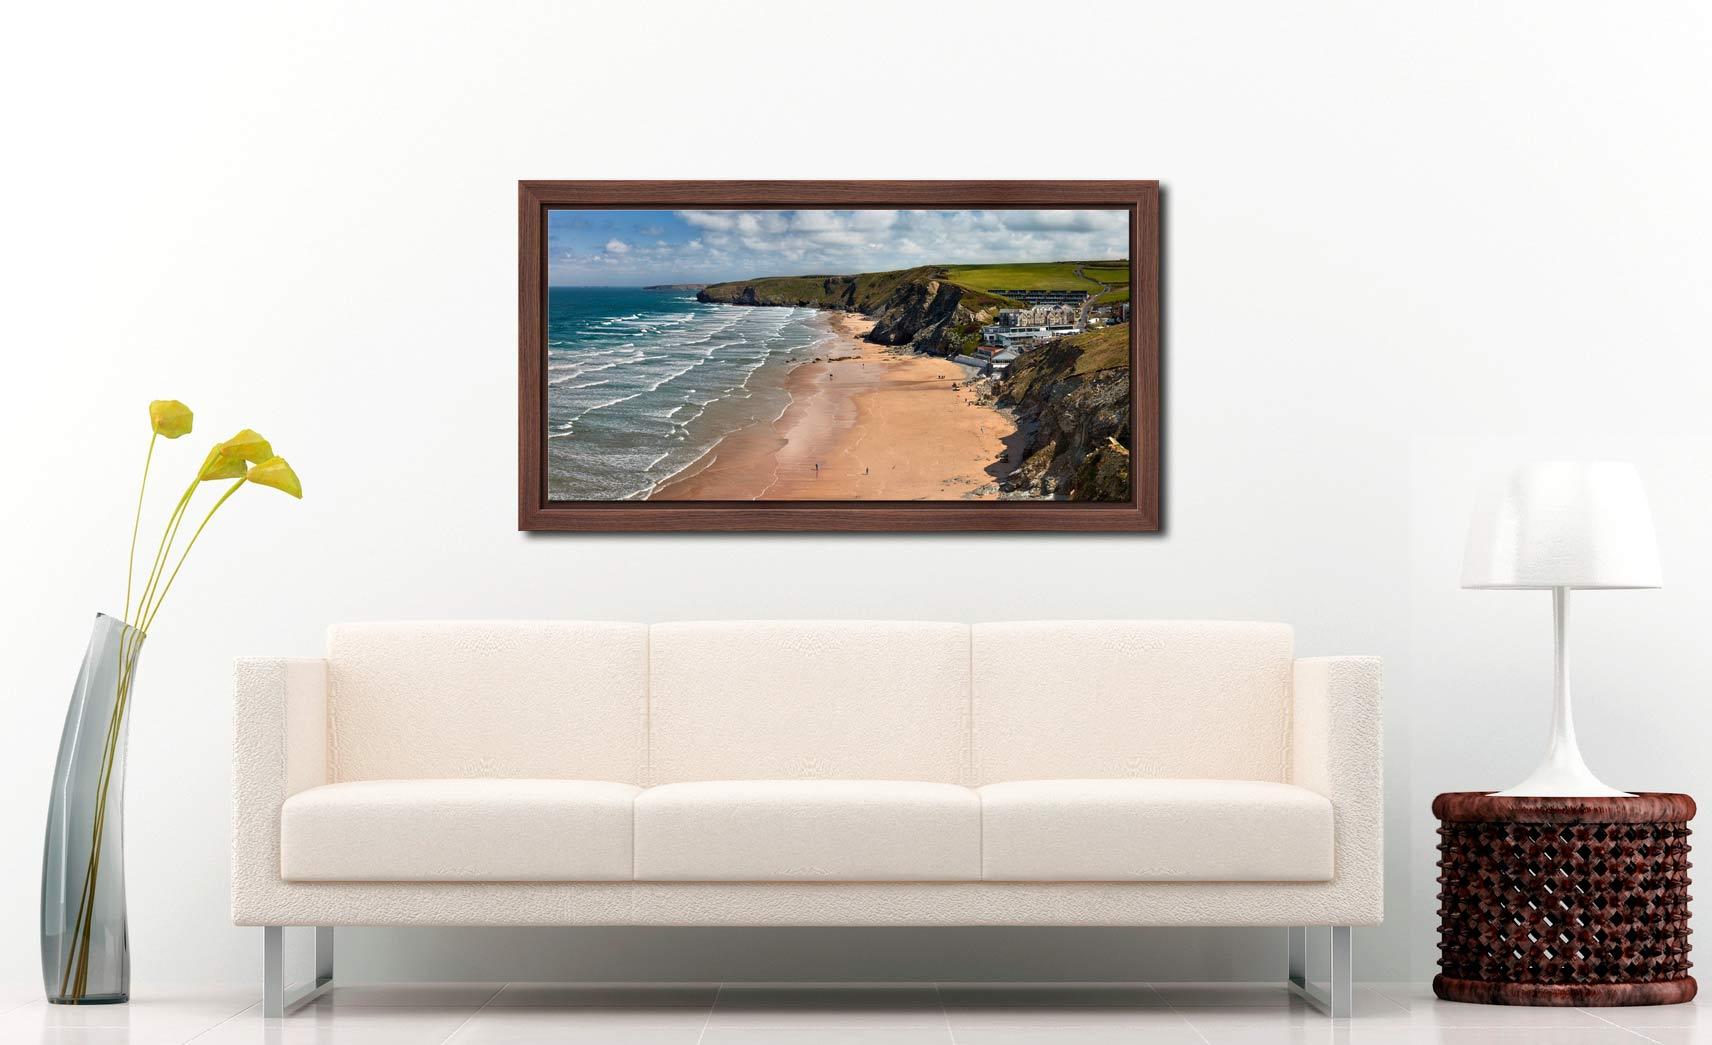 Watergate Bay Beach - Walnut floater frame with acrylic glazing on Wall